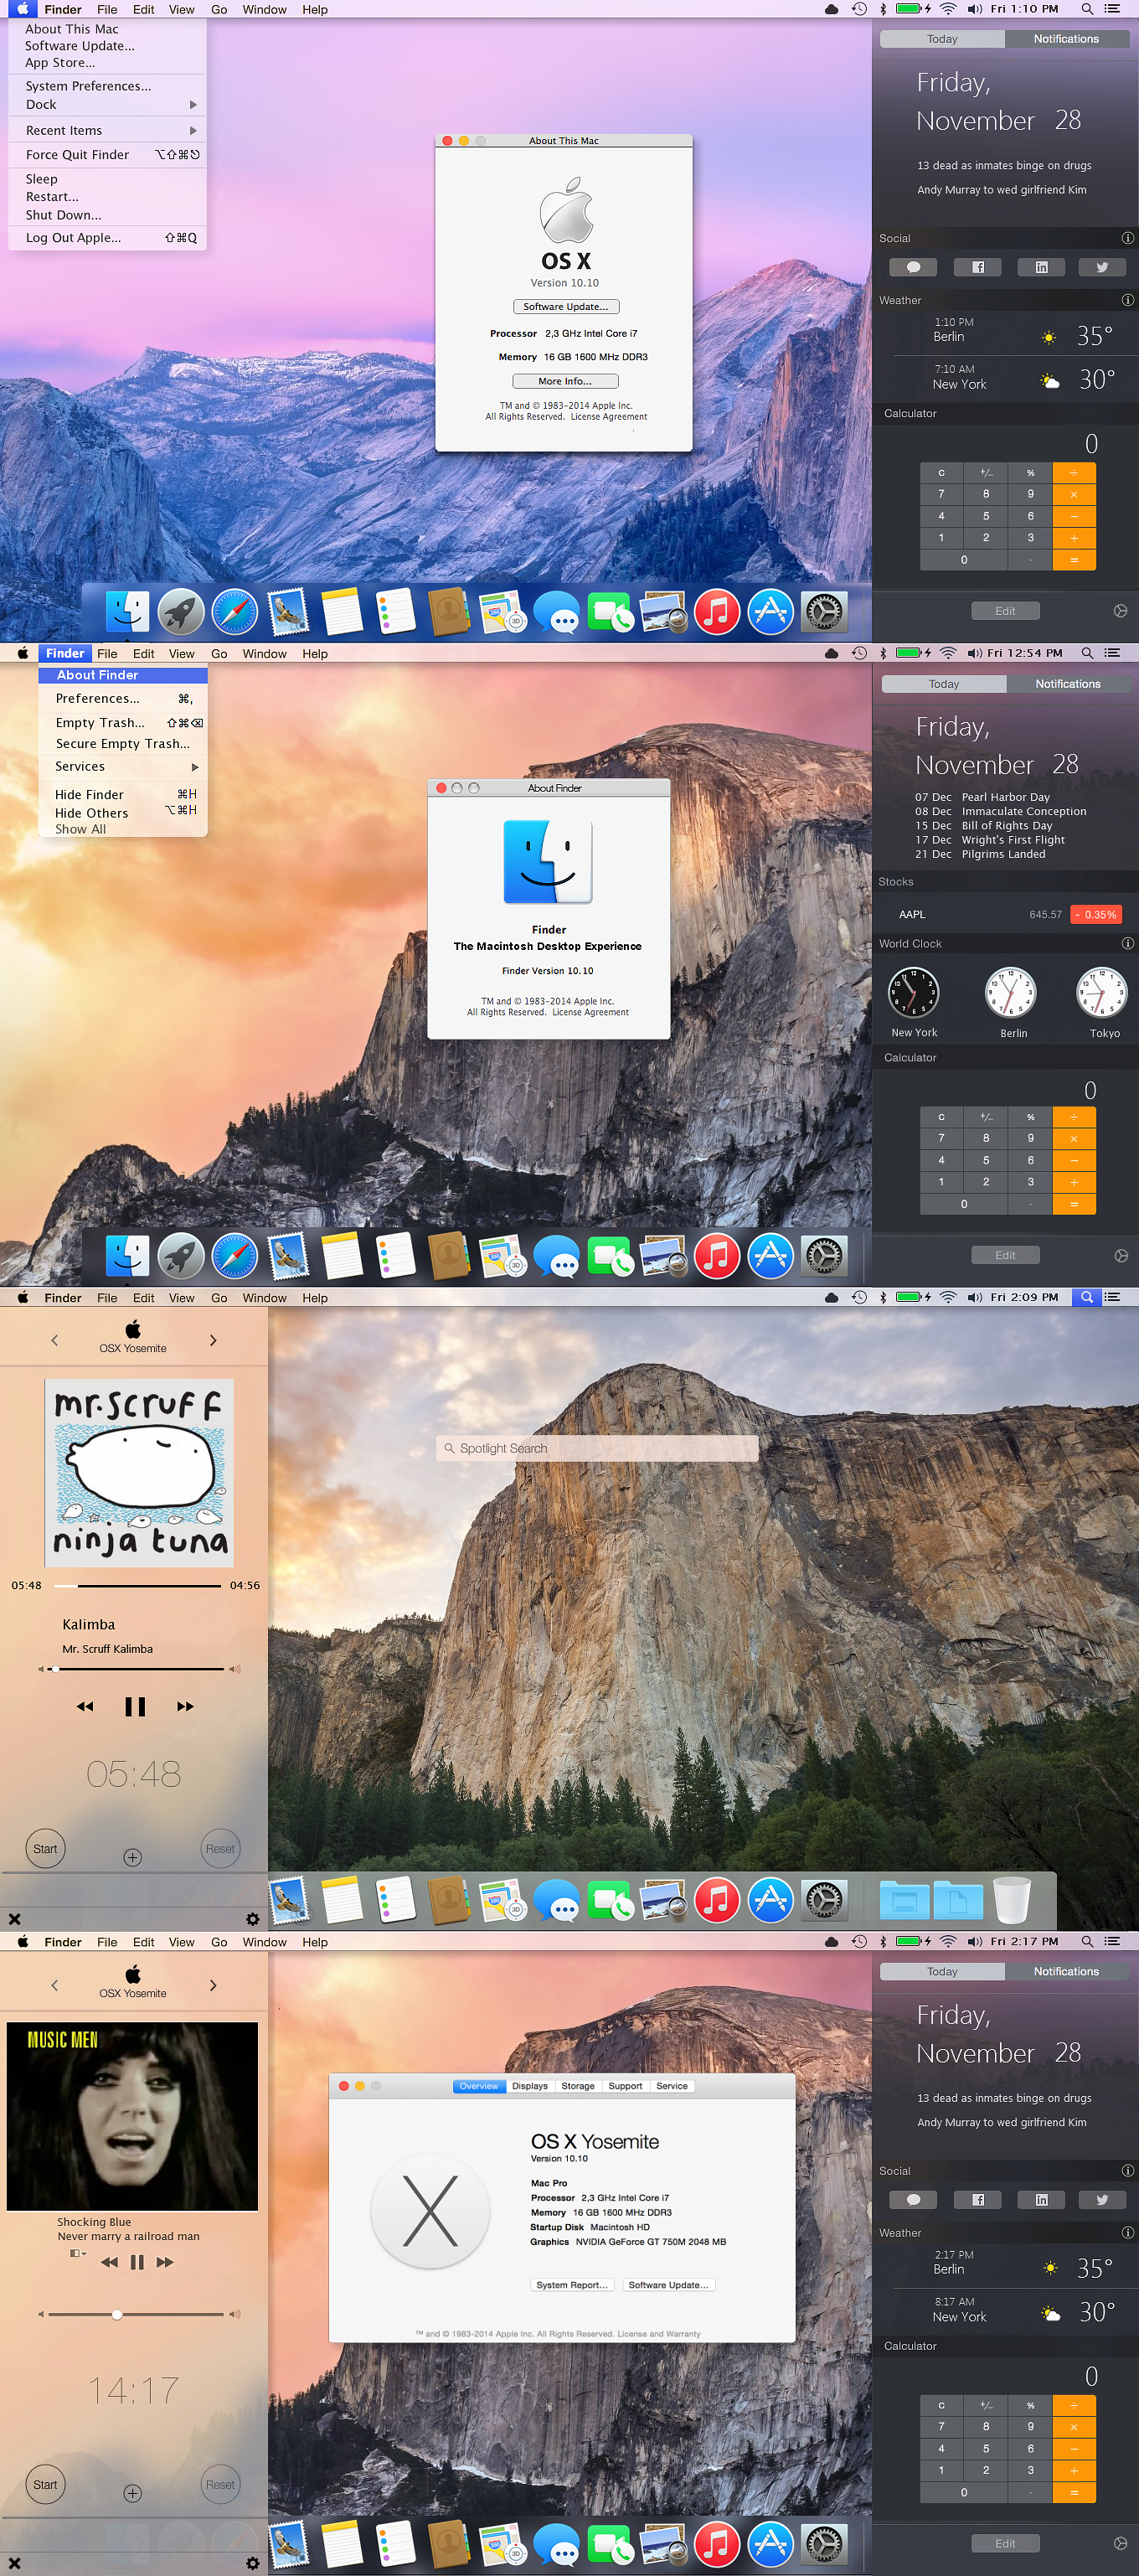 OSX Yosemite Finderbar 2.0 for all Windows OS